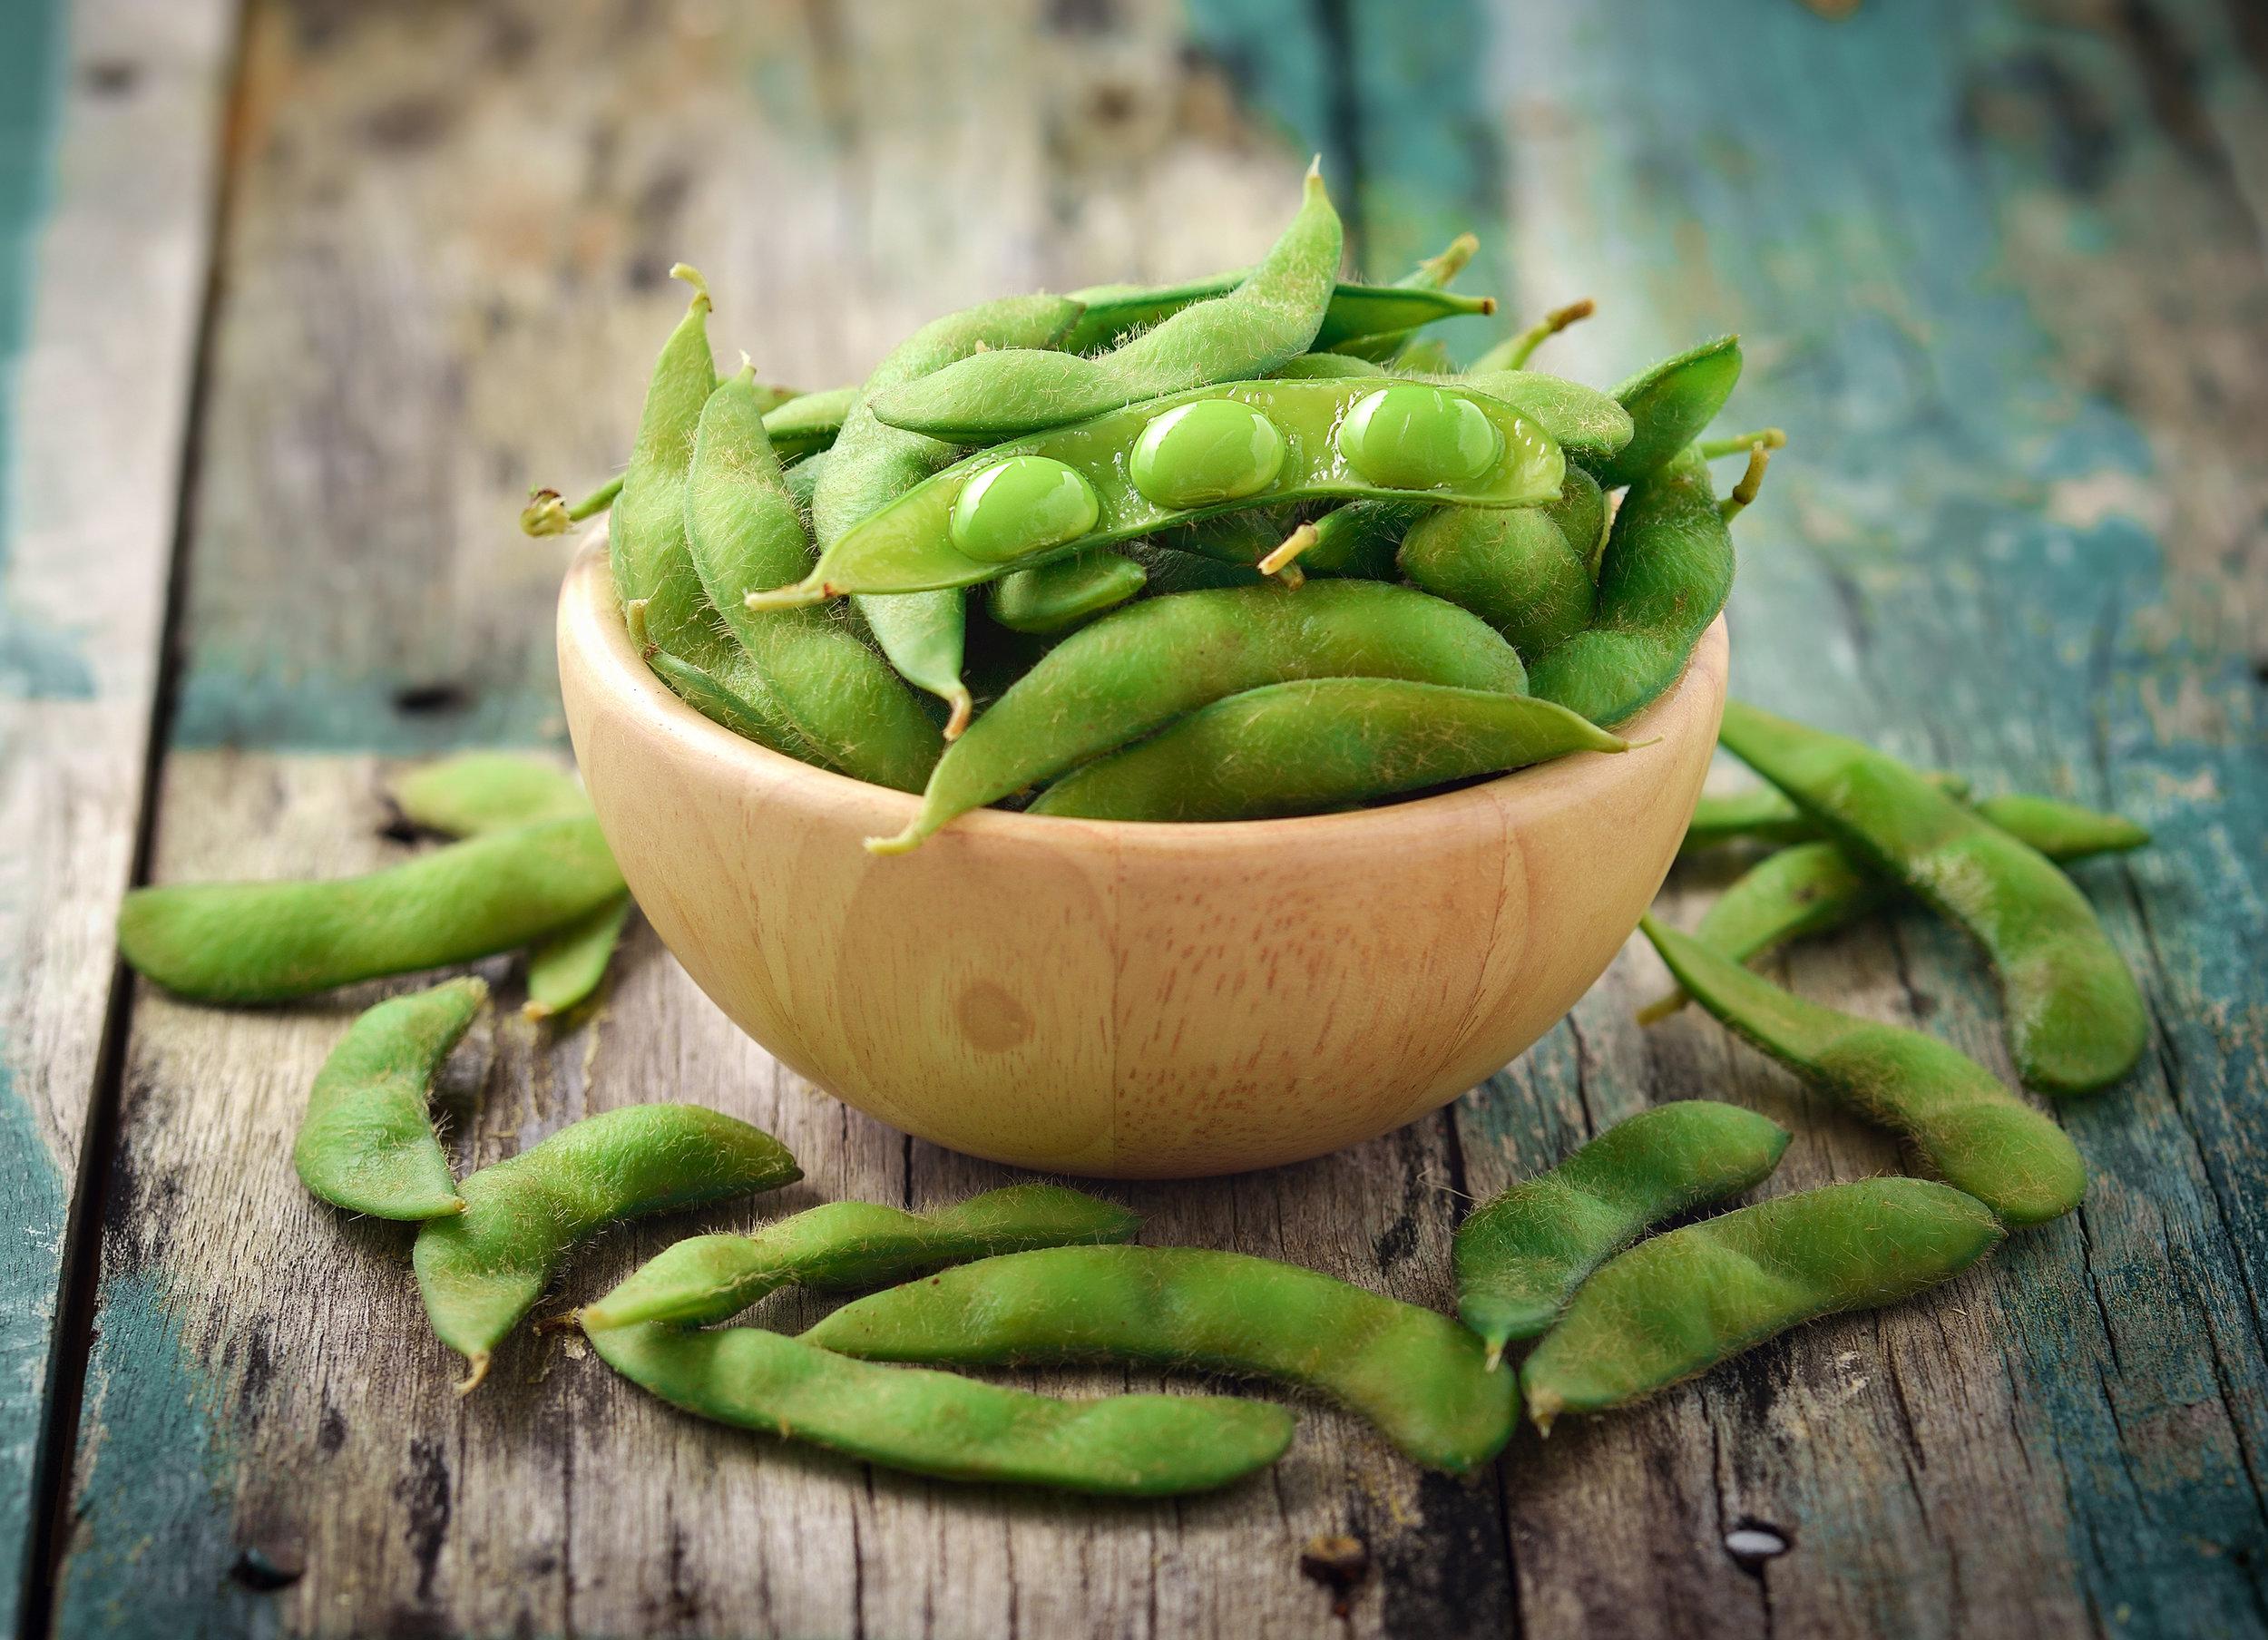 Edamame Recette Fèves de soya Soynut Soybean Greens Légumineuses Hubert Cormier Nutritionniste